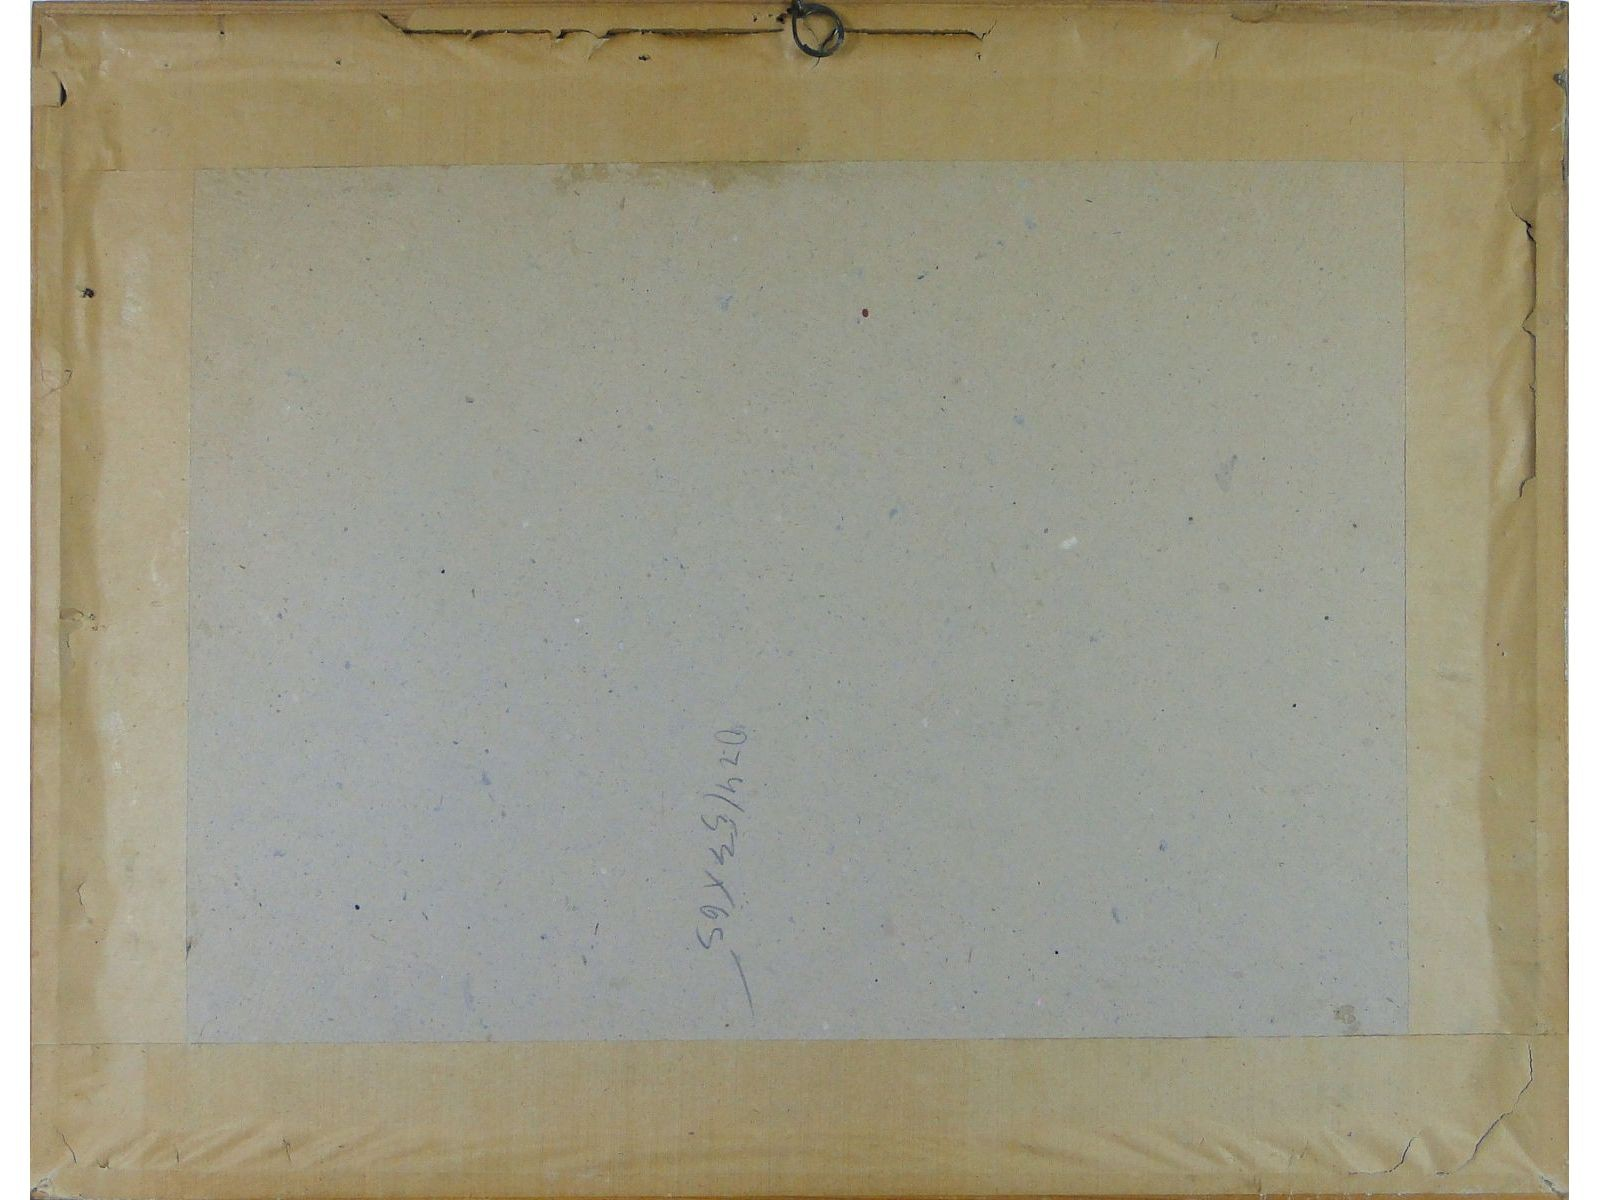 DSC04855.JPG (1600×1200)